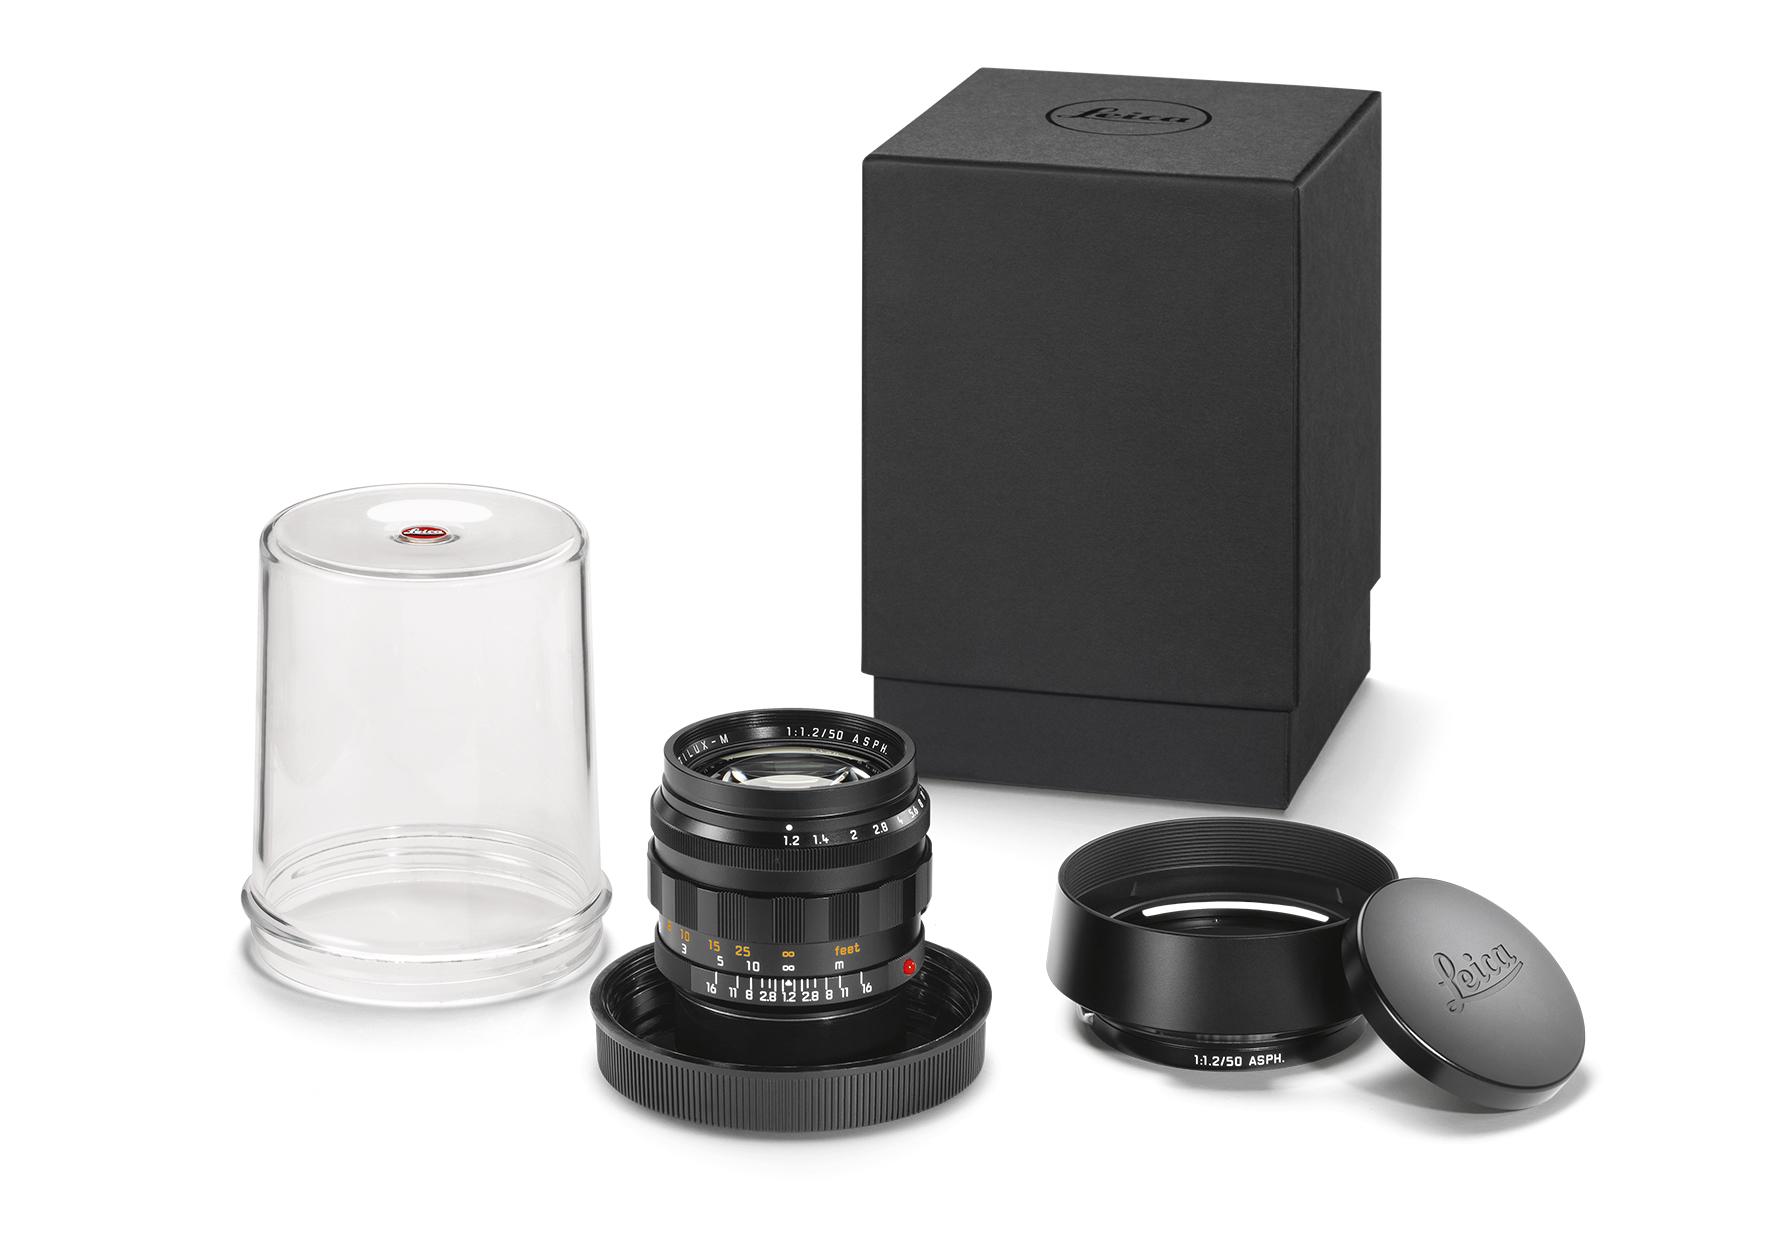 Das Leica Noctilux-M 1:1.2/50 ASPH in schwarzer Ausführung. (c) Leica Camera AG